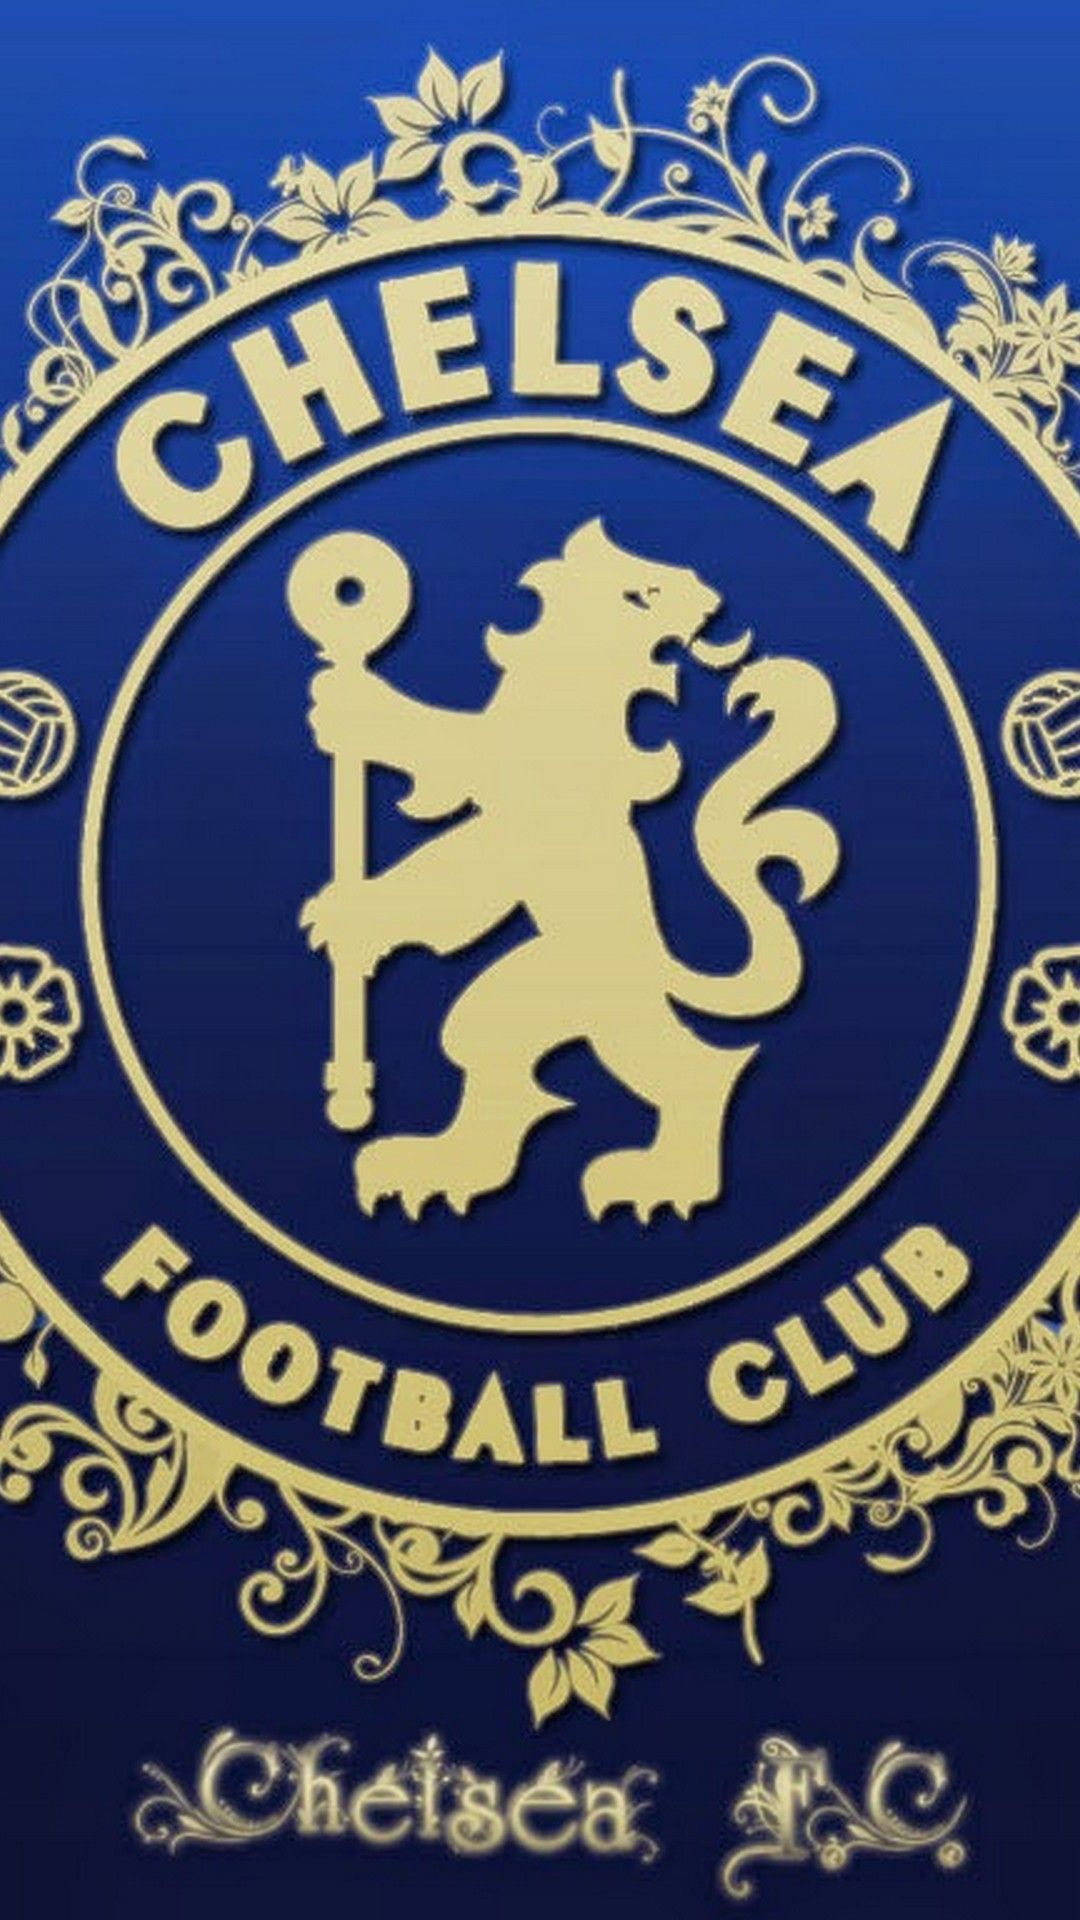 Chelsea Football Club Iphone Wallpapers Best Wallpaper Hd Chelsea Football Club Wallpapers Chelsea Football Football Wallpaper